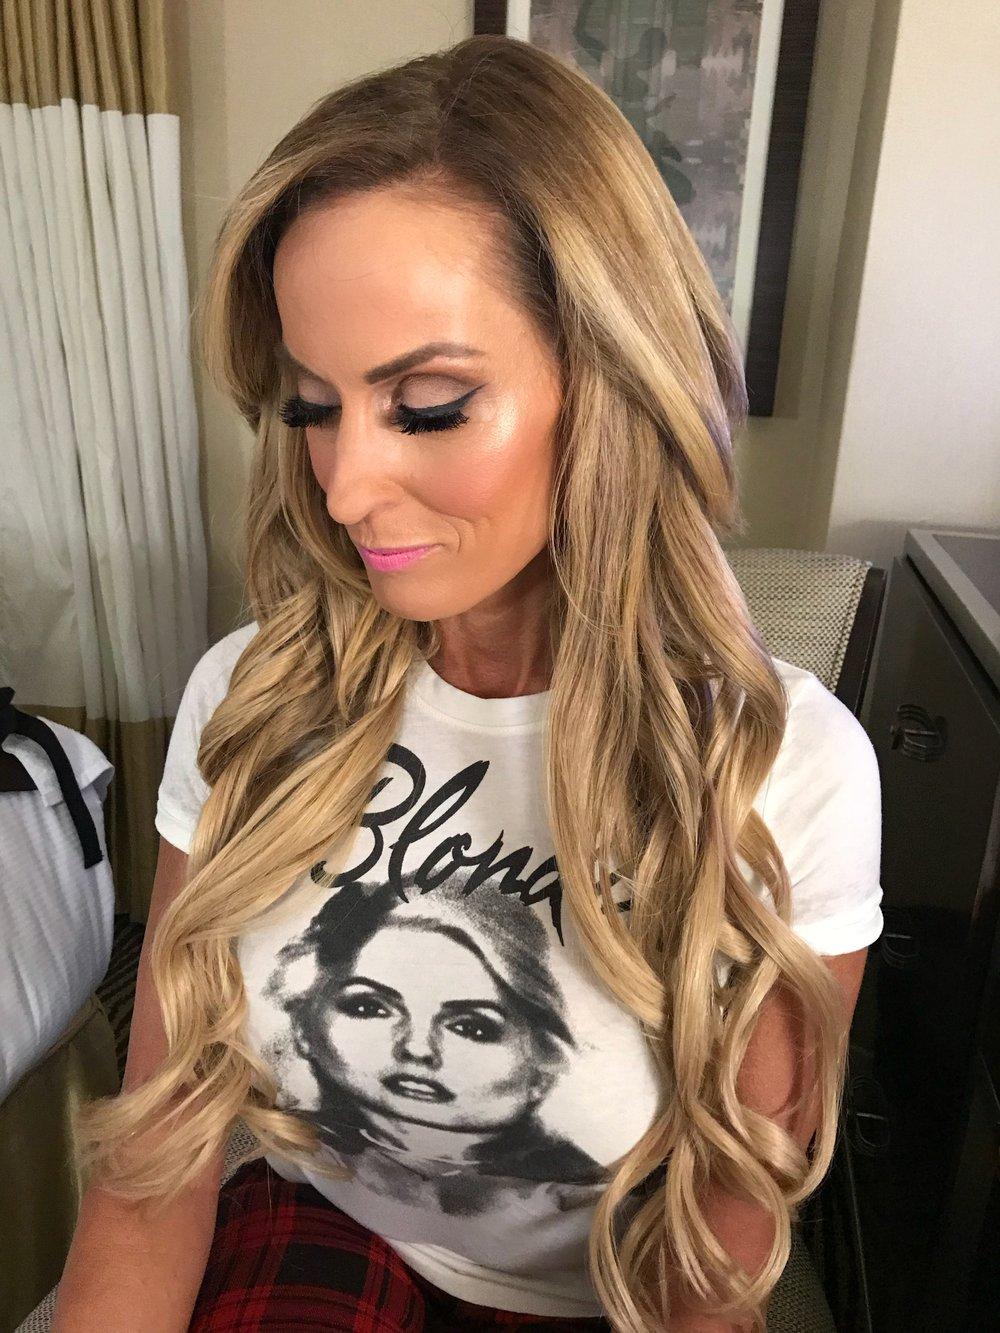 Hair and Makeup on Dana Warrior